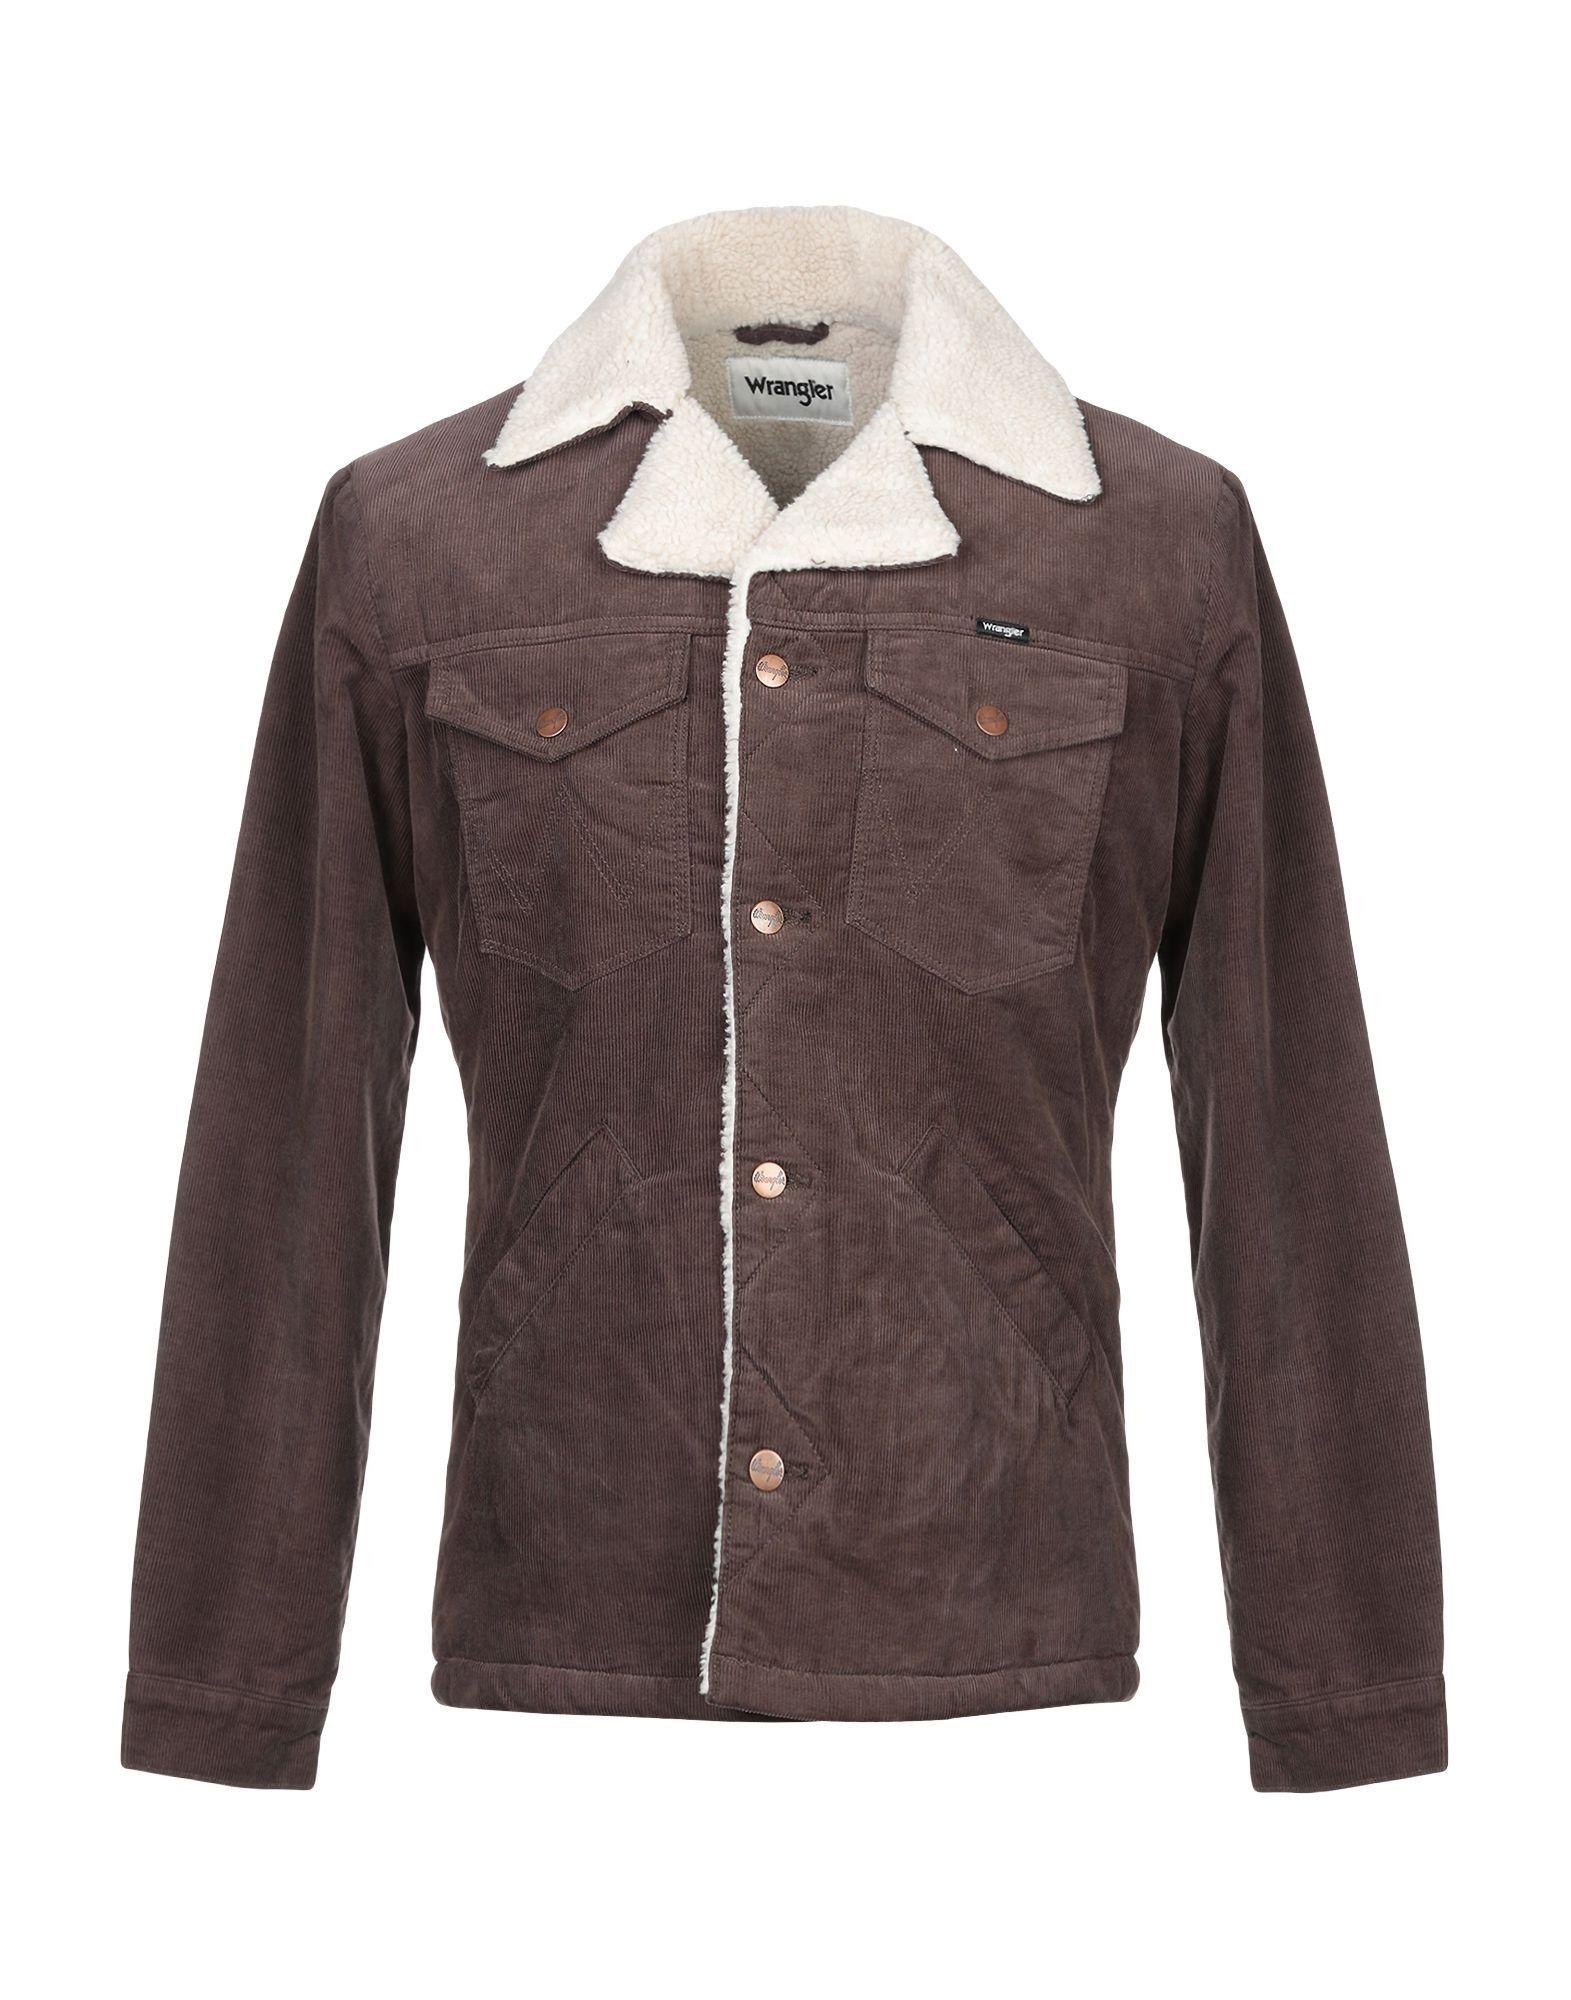 Wrangler Jacket In Dark Brown Modesens Jackets Wrangler Leather Jacket [ 2000 x 1571 Pixel ]